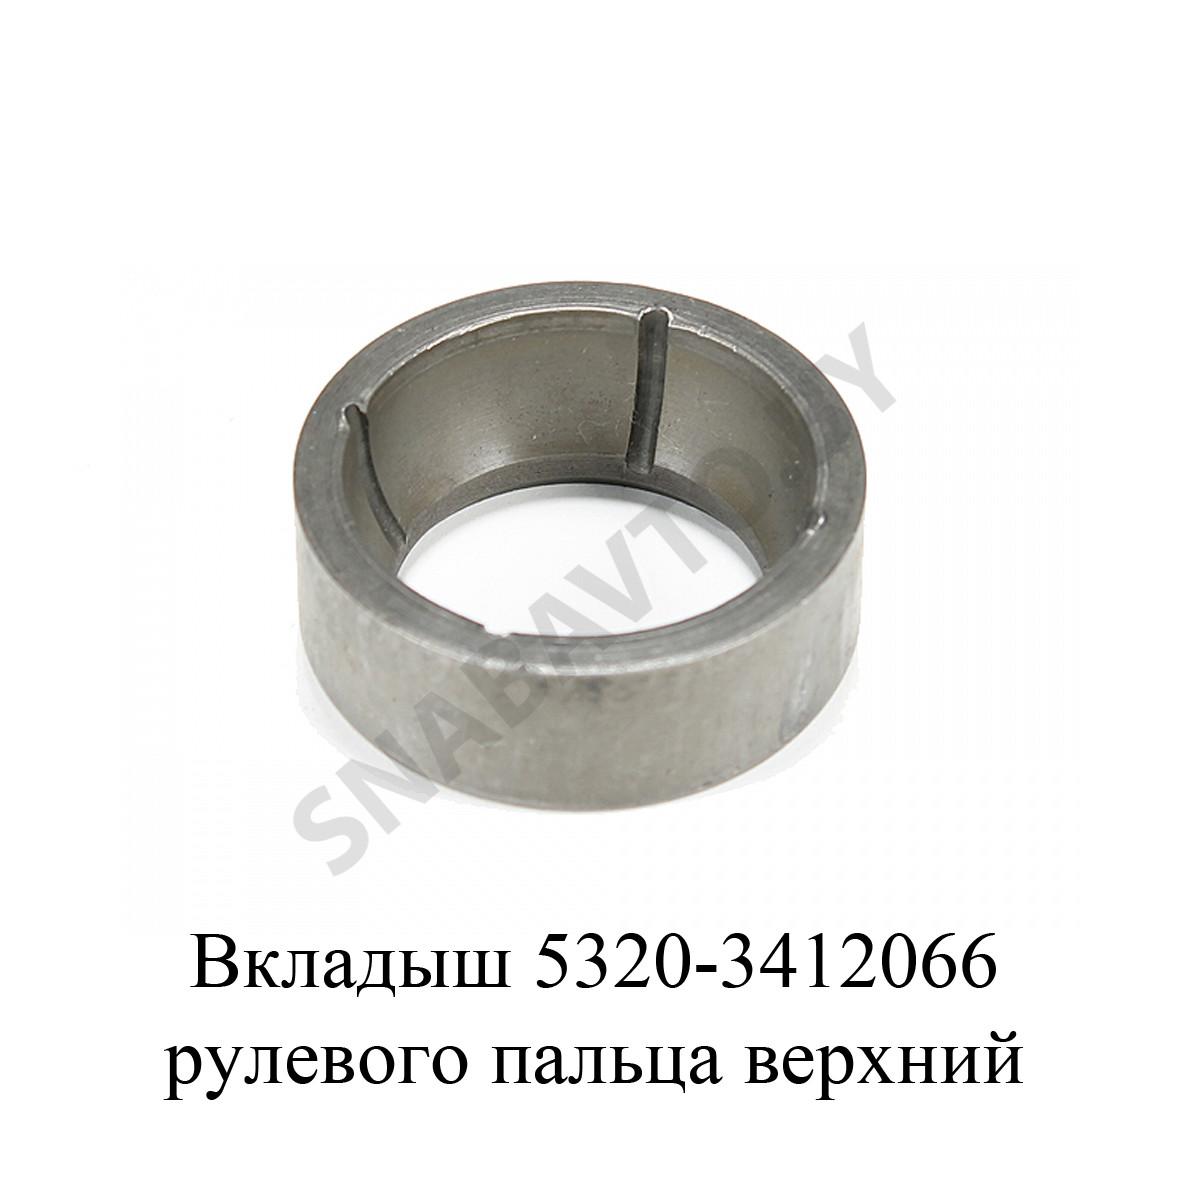 5320-3412066